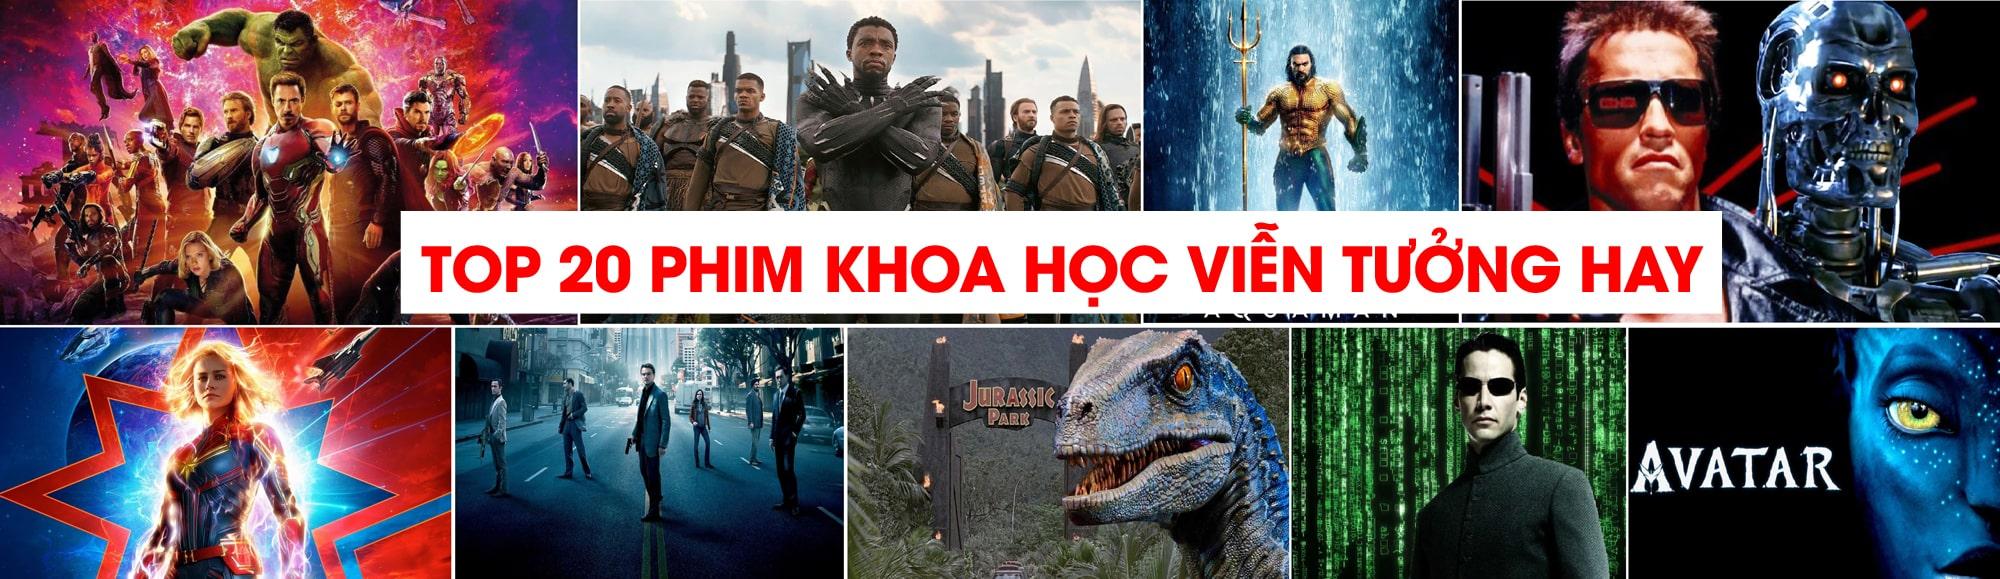 phim-khoa-hoc-vien-tuong-hay-nhat-moi-thoi-dai